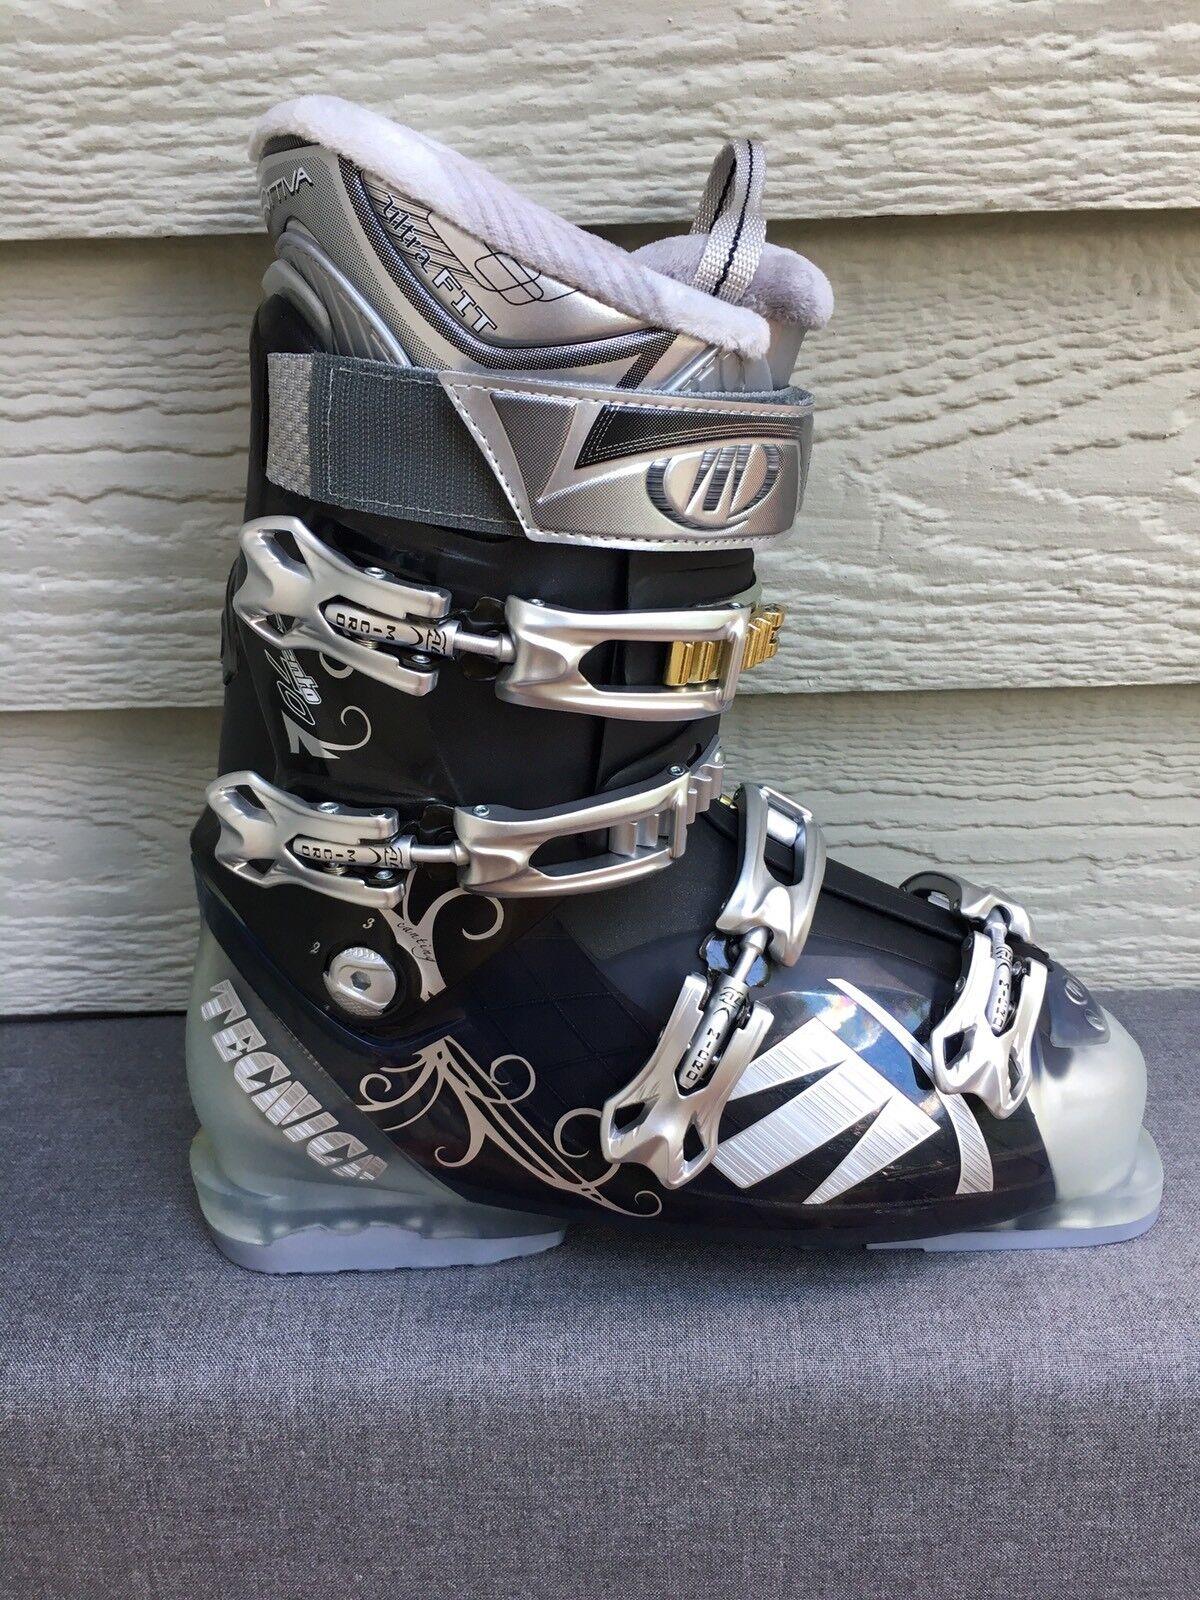 Tecnica Vento 70 Ultrafit Women's Ski boot - Mondo 27.0 (Women's US Size 10) NEW